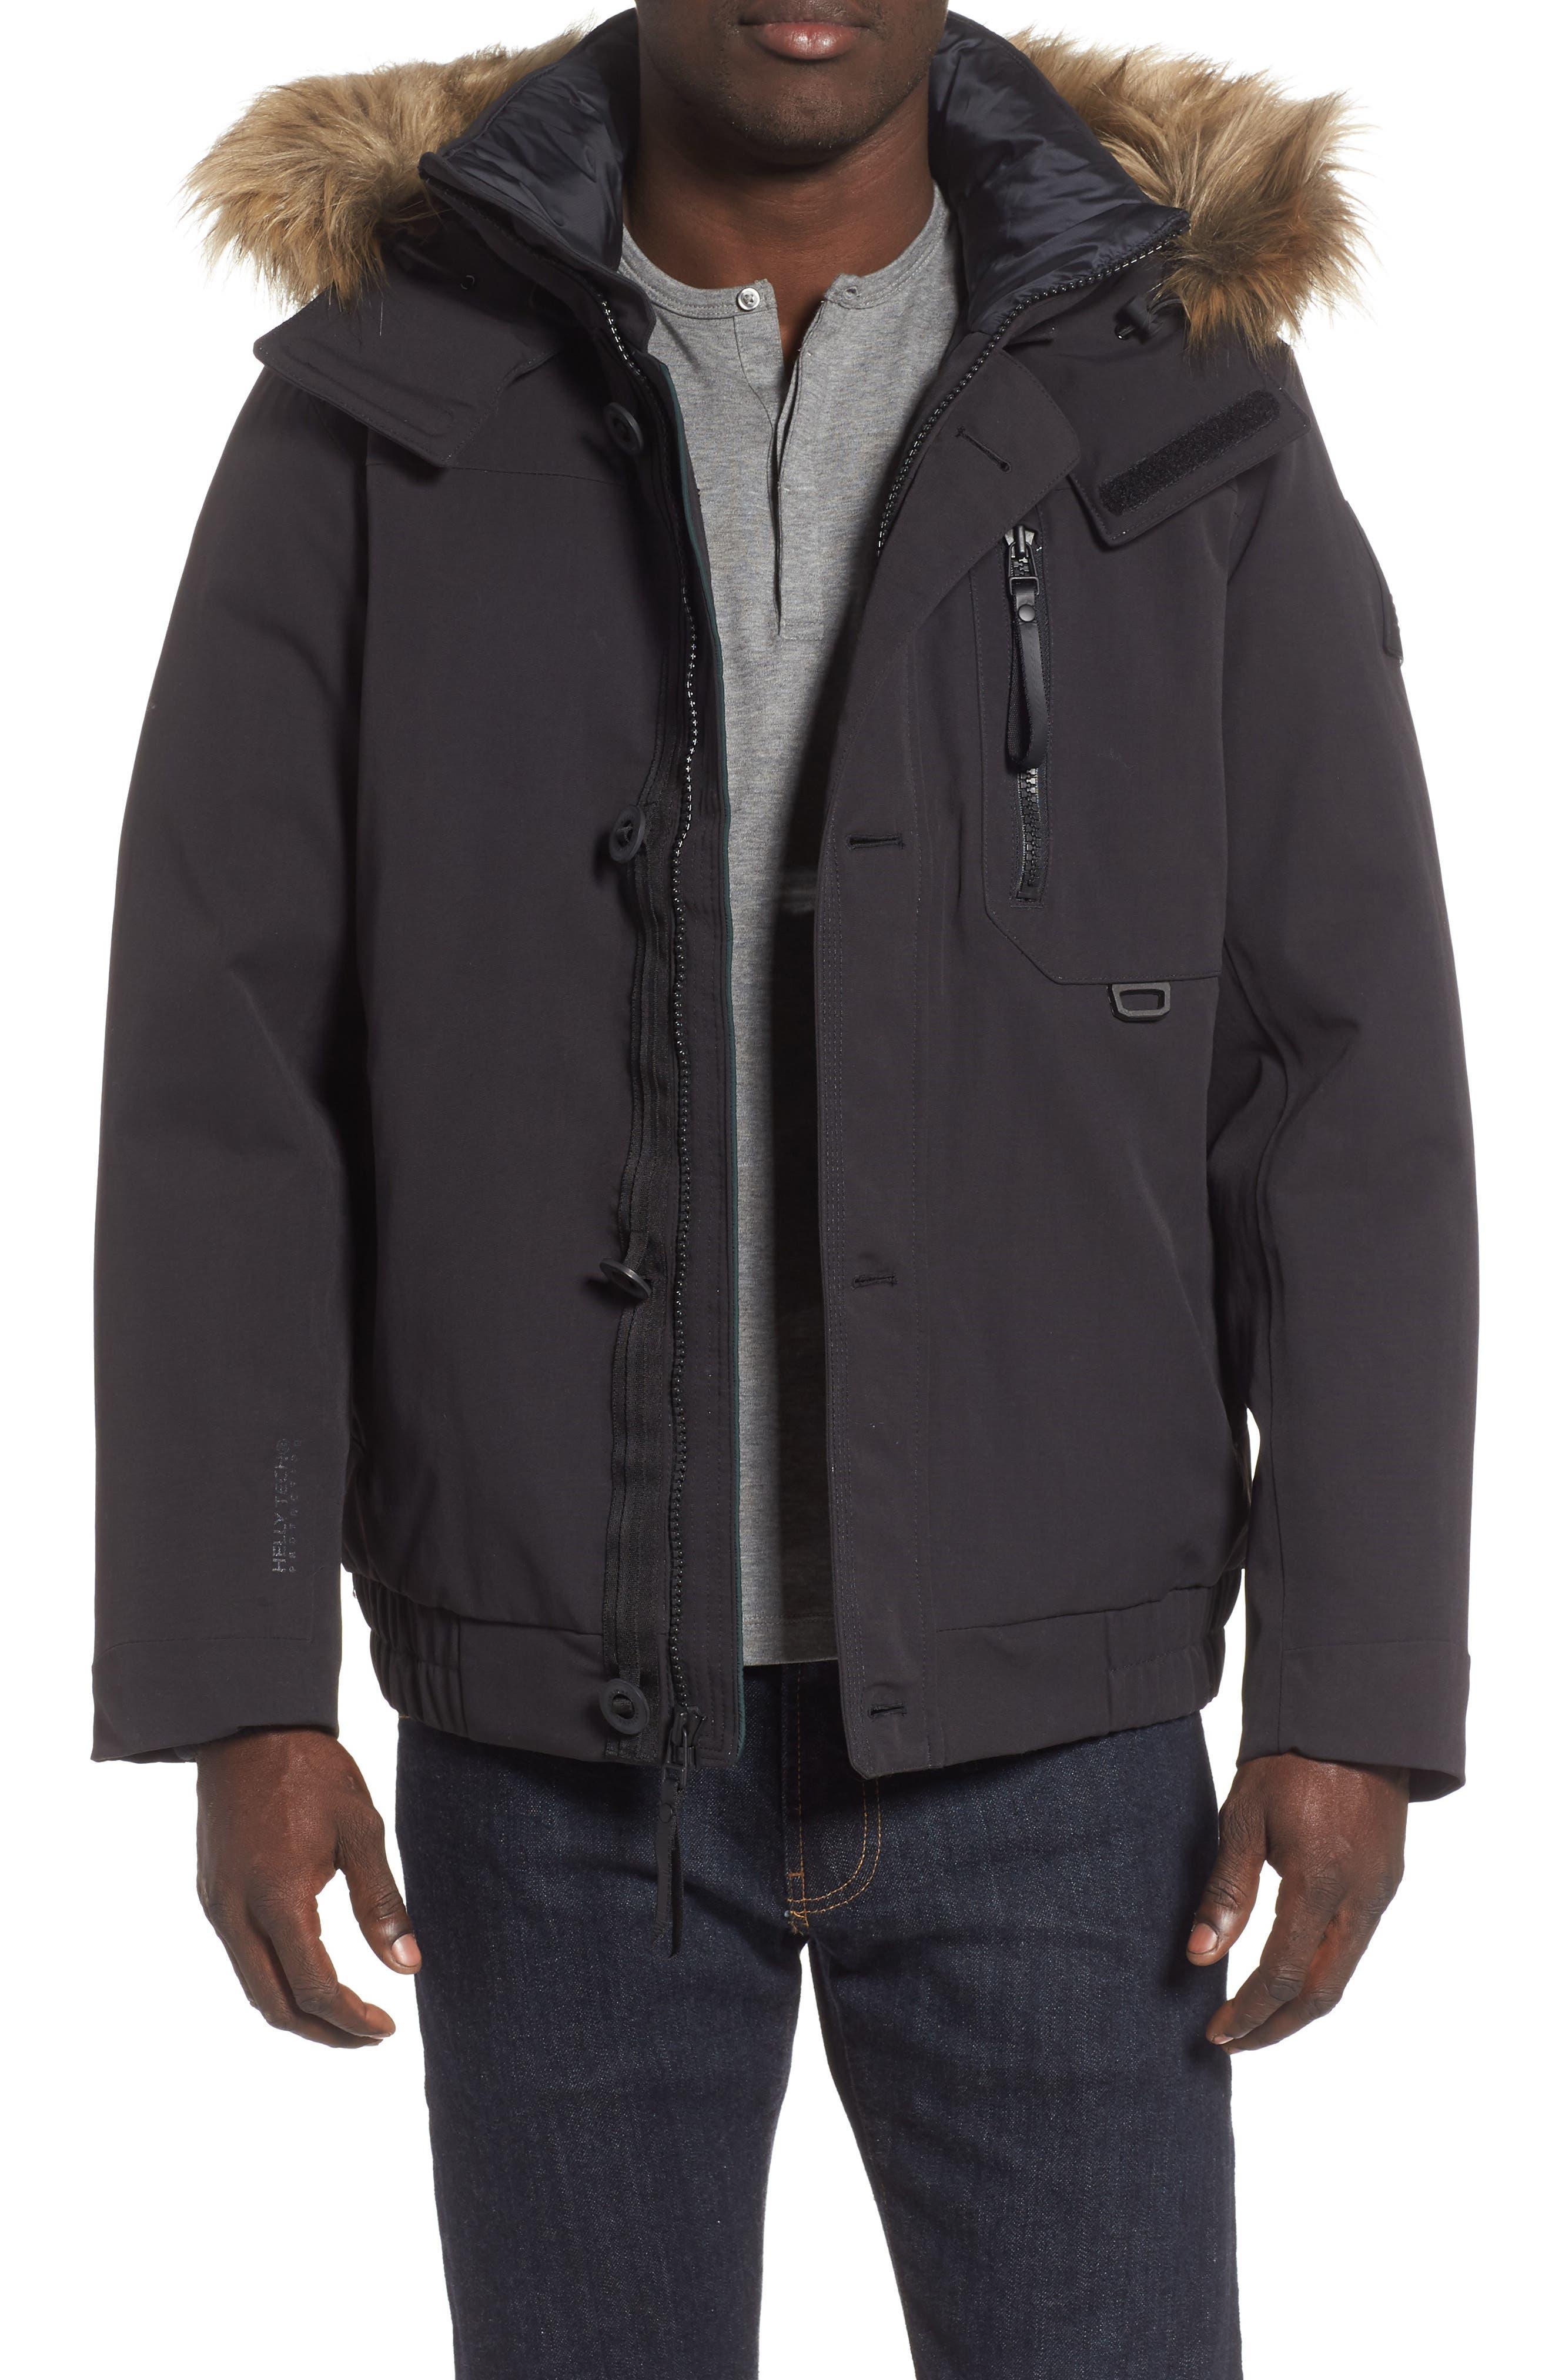 Helly Hansen Bardu Waterproof Bomber Jacket With Detachable Hood And Faux Fur Trim